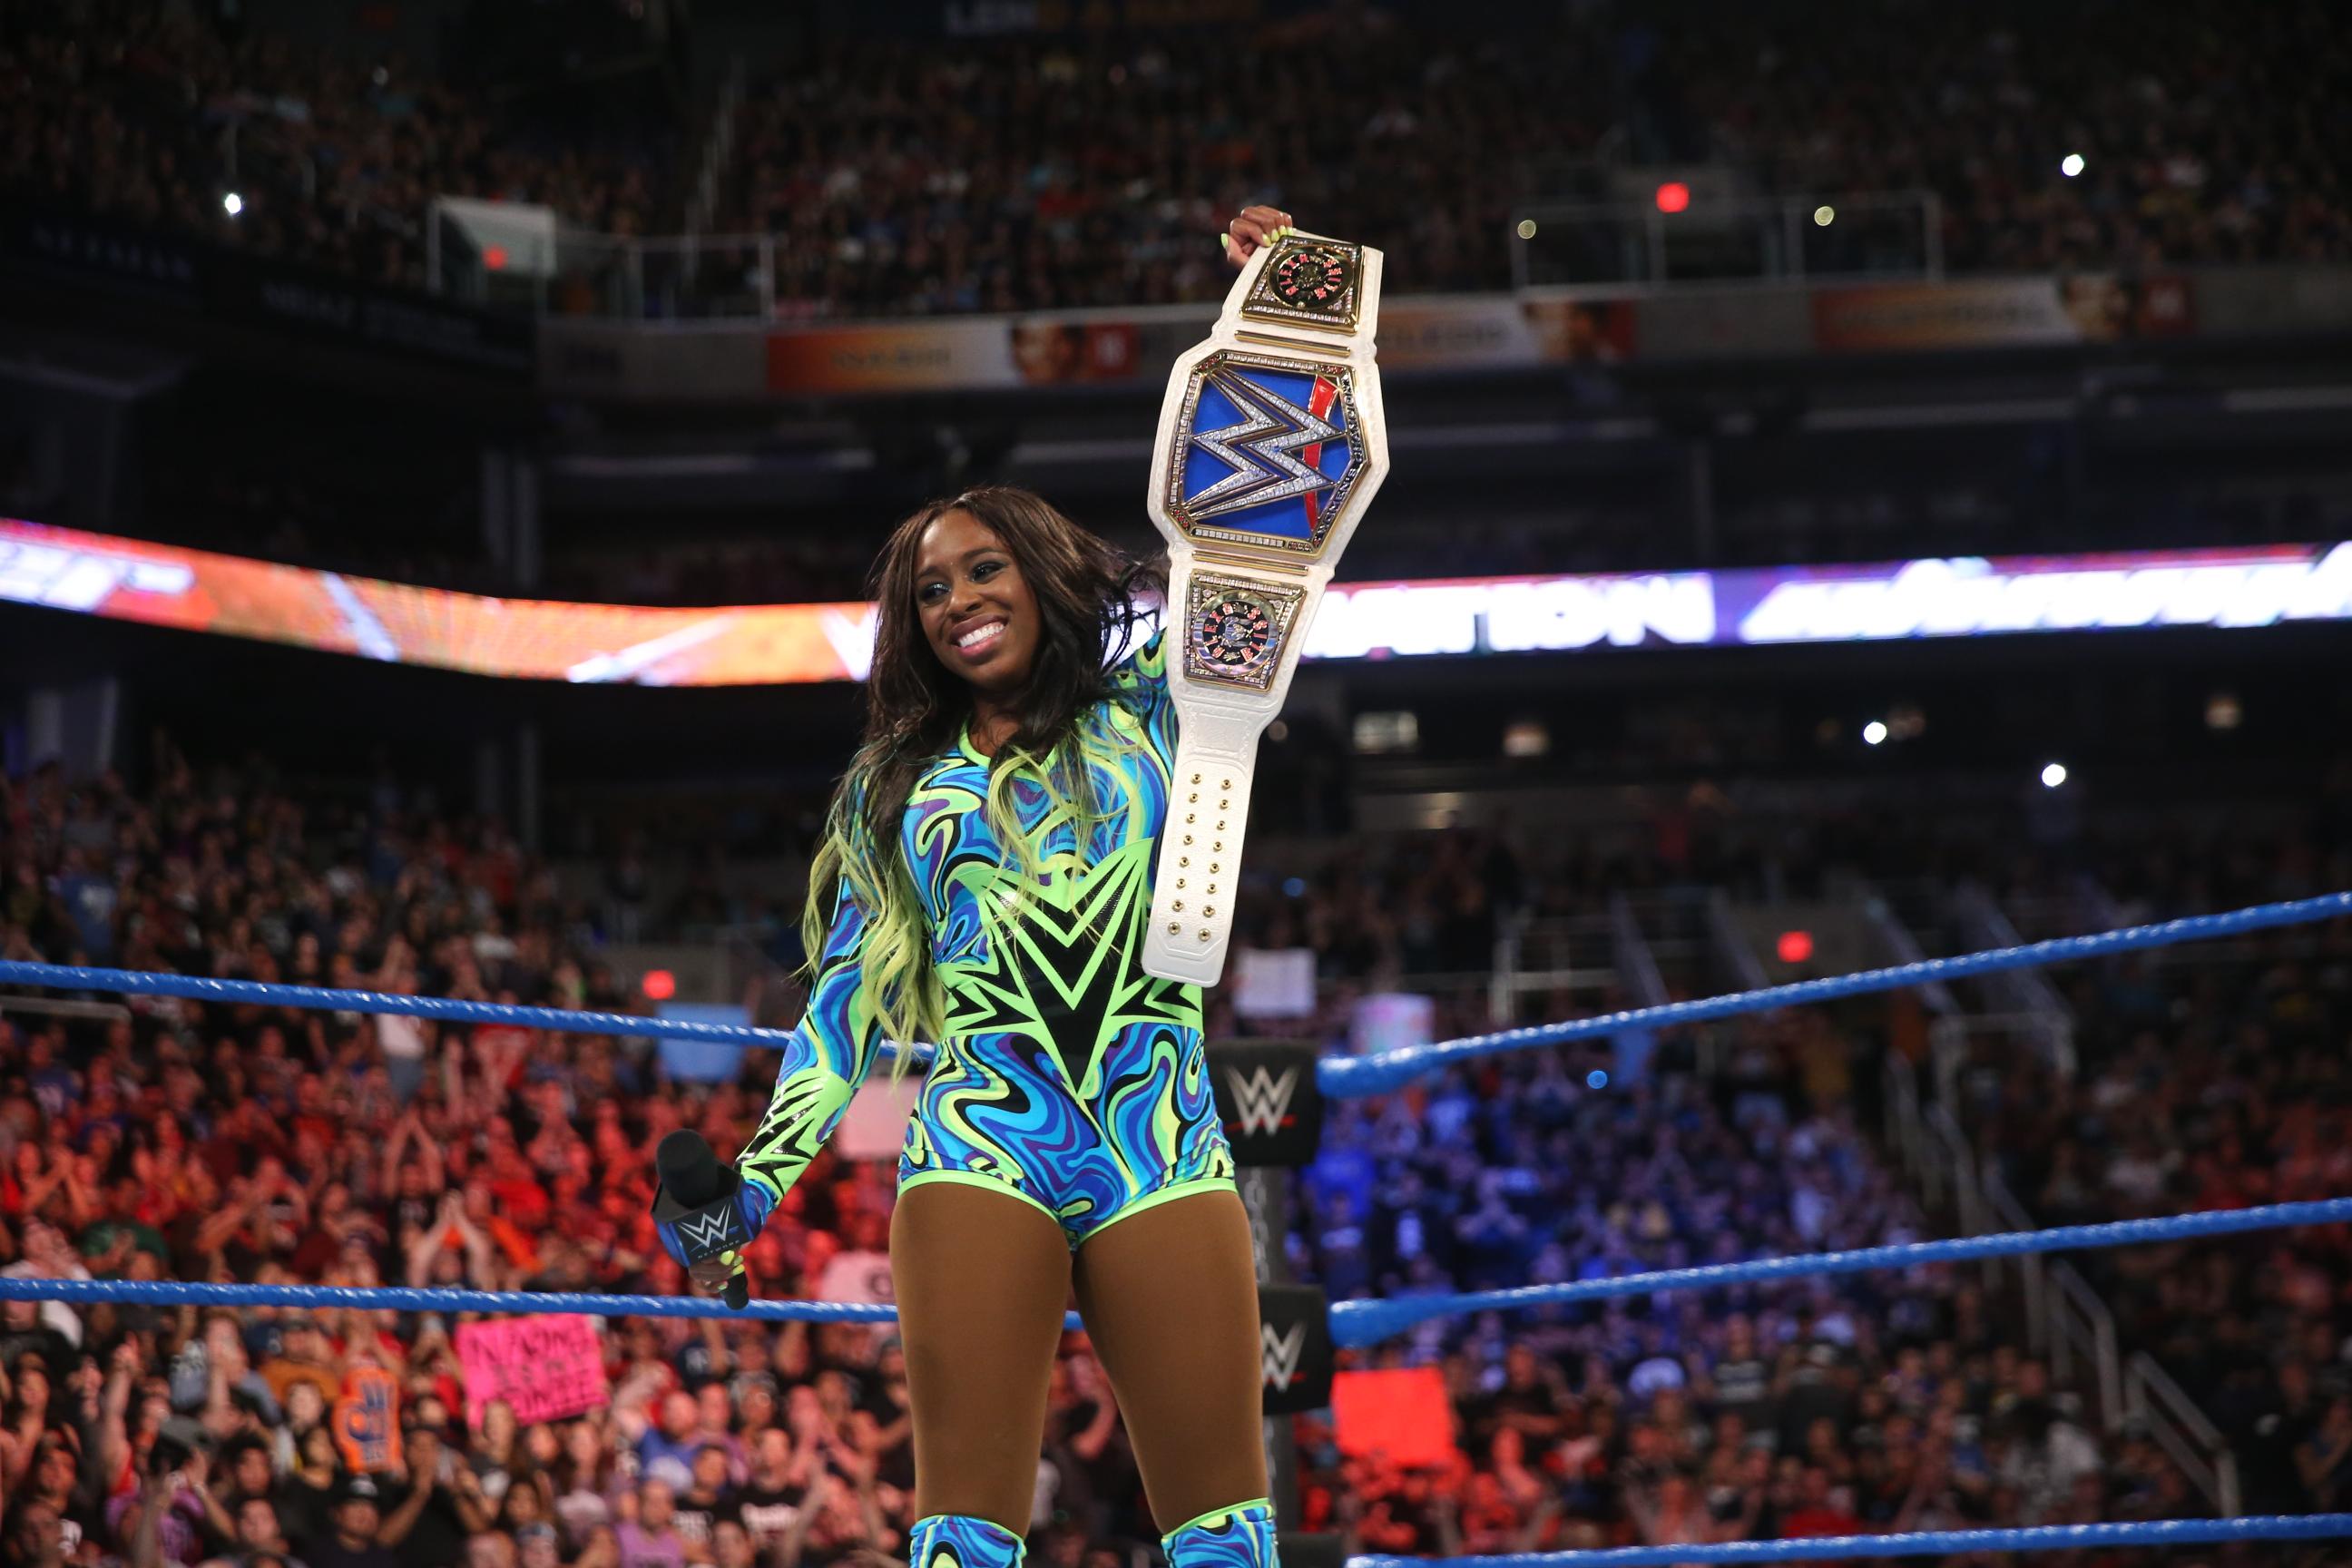 Wwe Superstar Naomi Glows To Victory